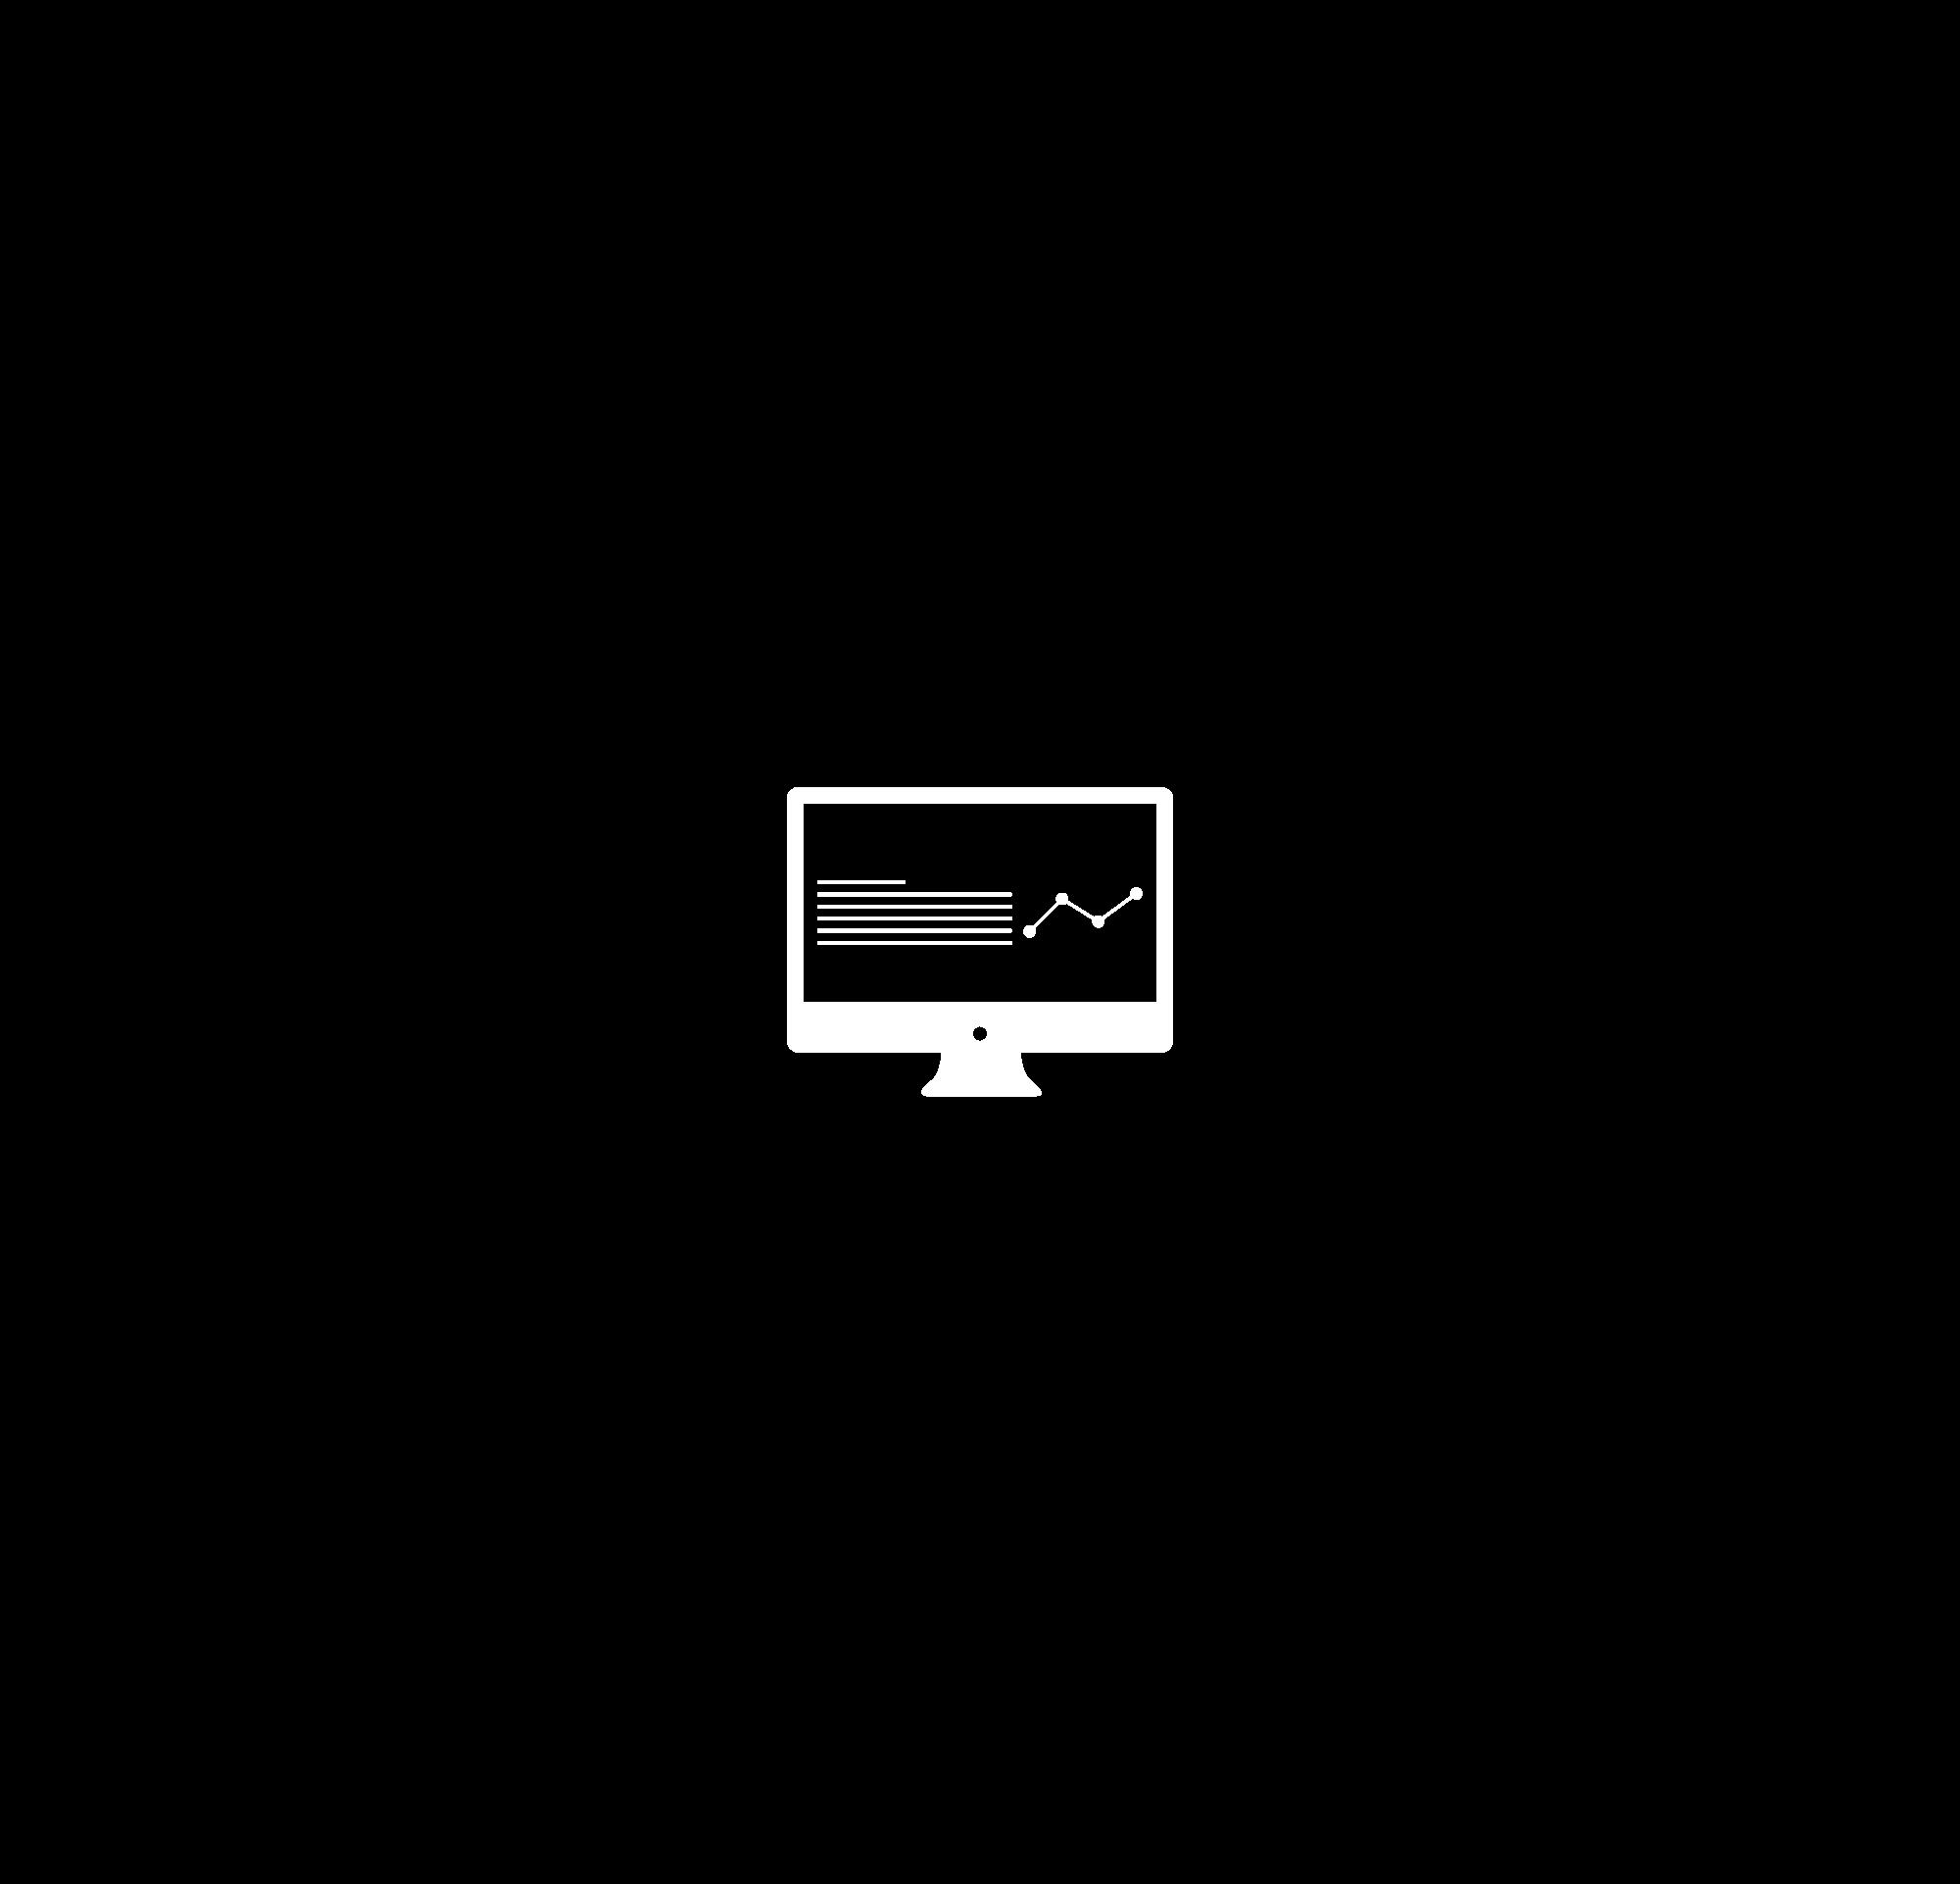 logo-white (4).png